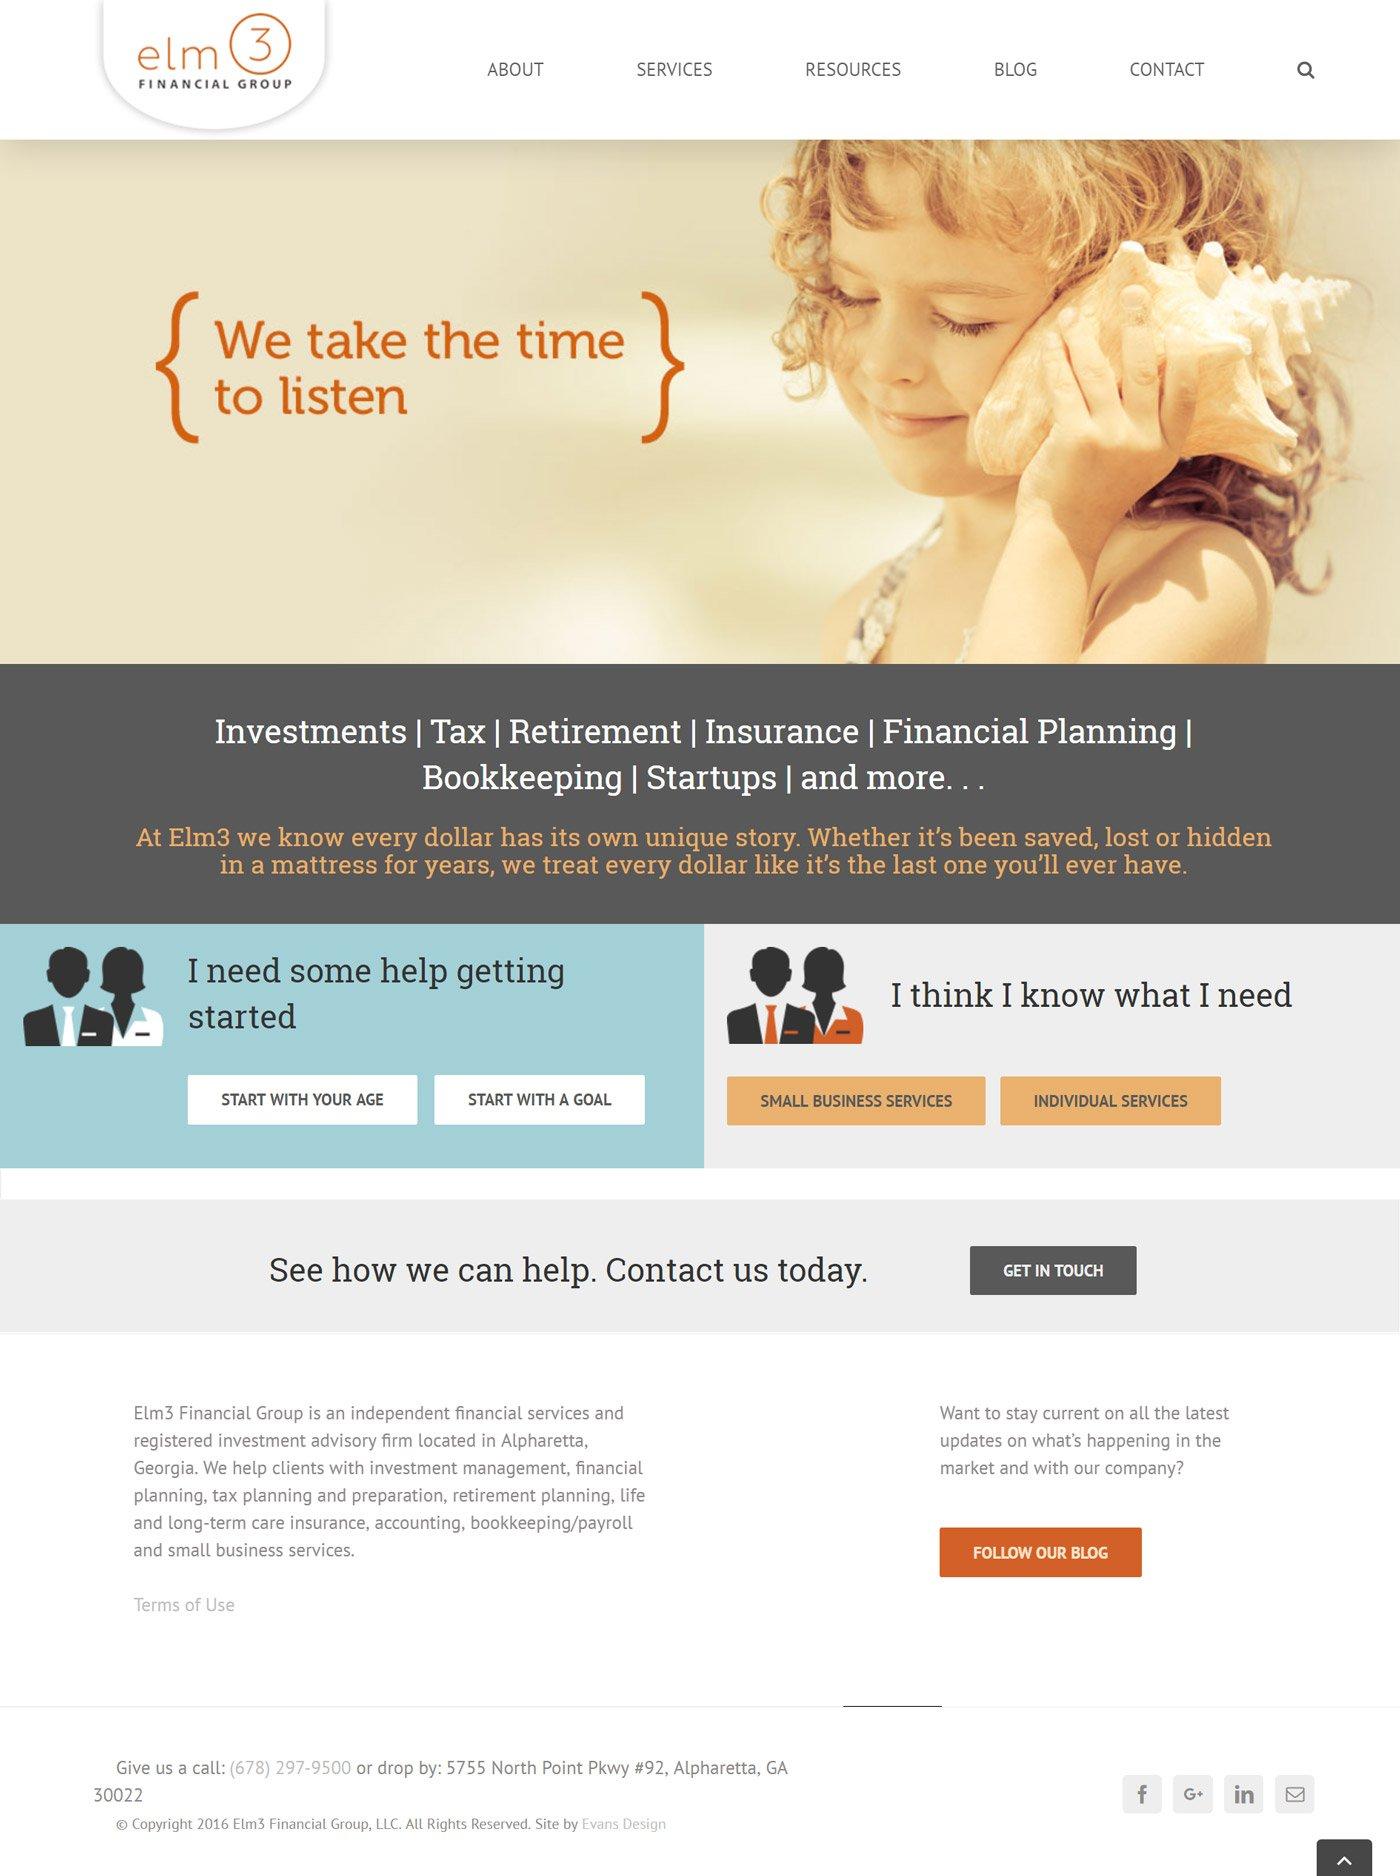 Custom WordPress Website Design for Elm 3 Financial